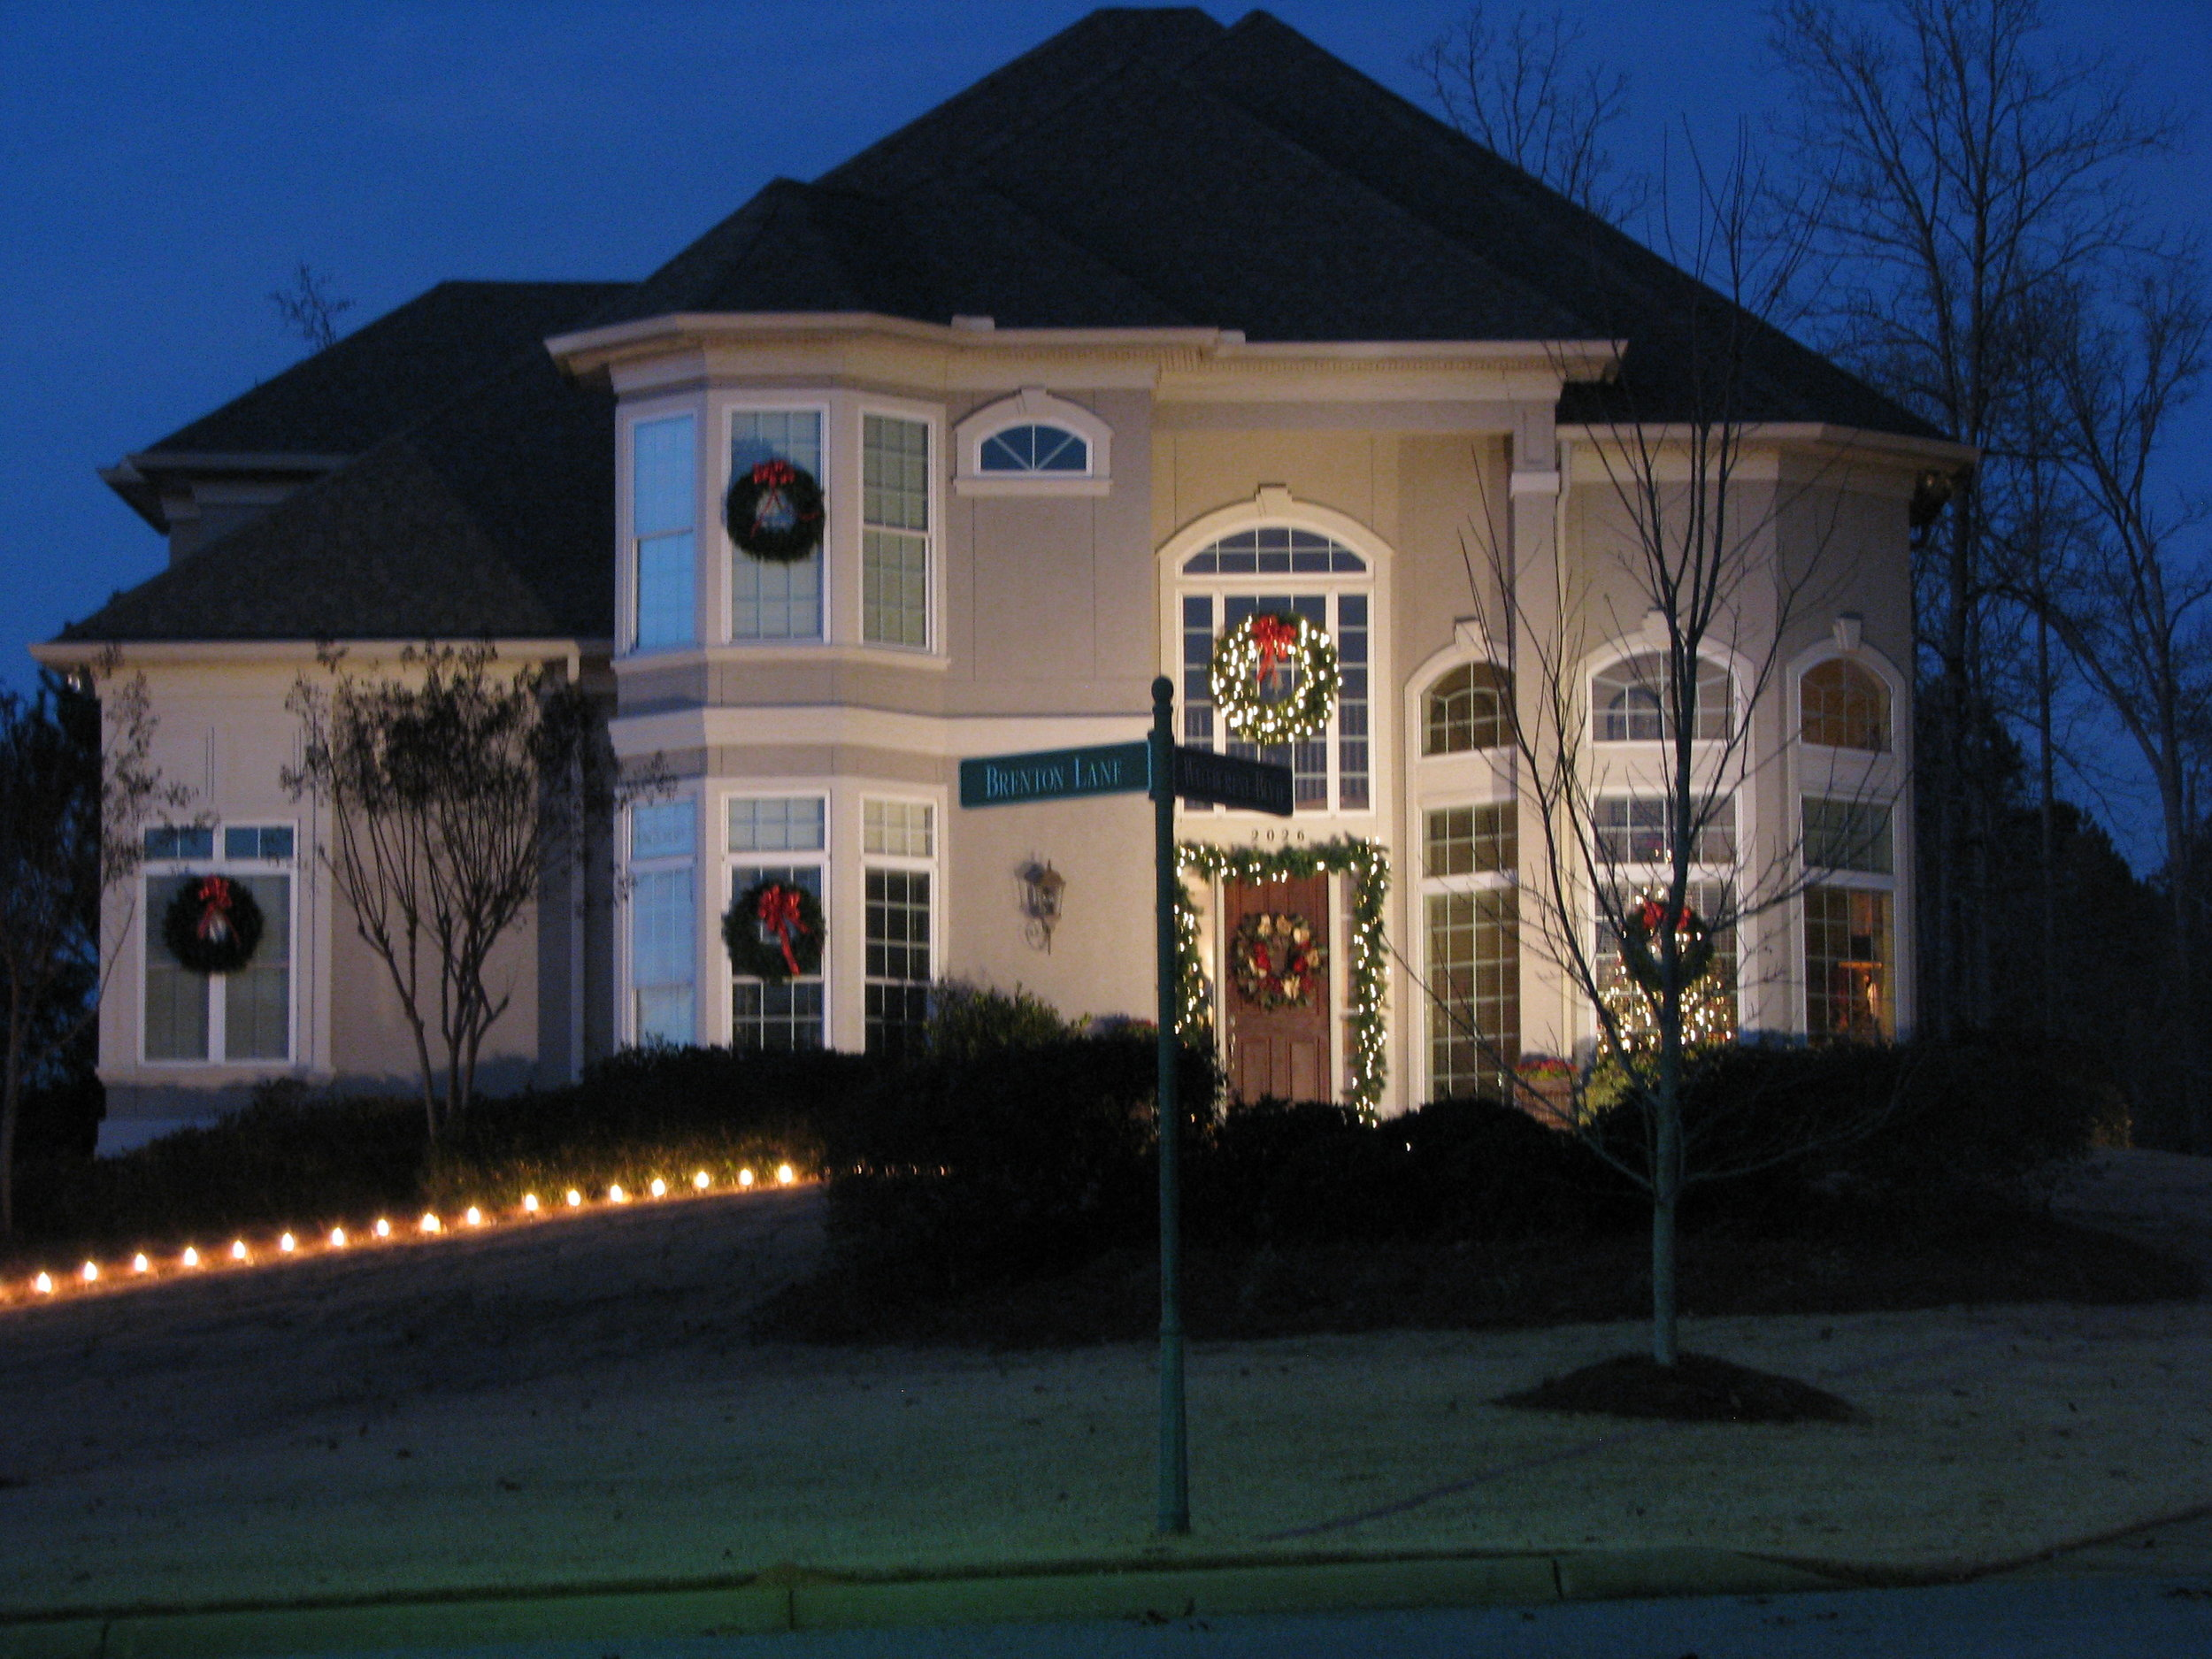 glitter and glow chrismas decor residential exterior (24).JPG